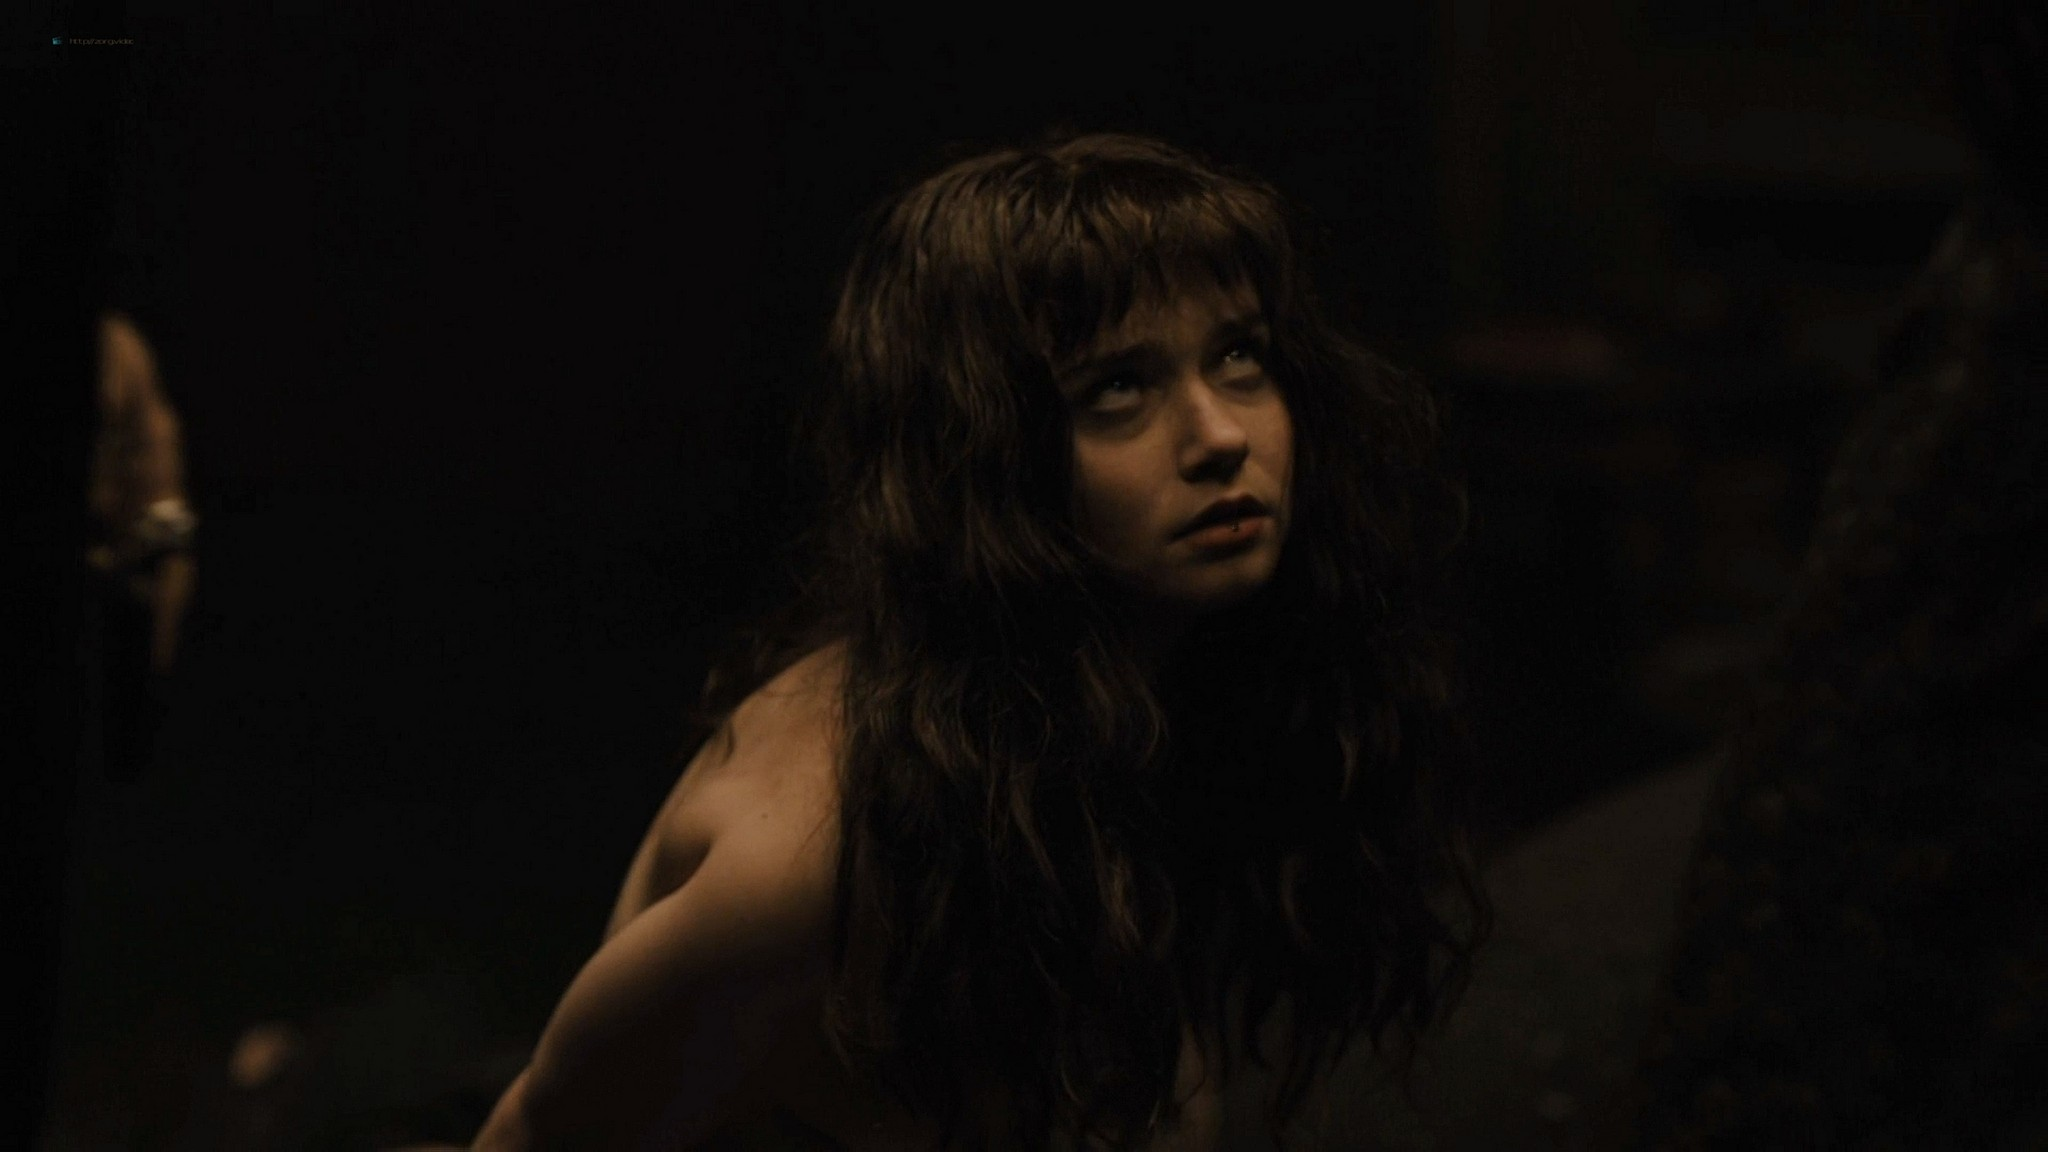 Jessica Barden nude full frontal, bush and boobs – Penny Dreadful s03e02 (2016) HD 1080p (2)